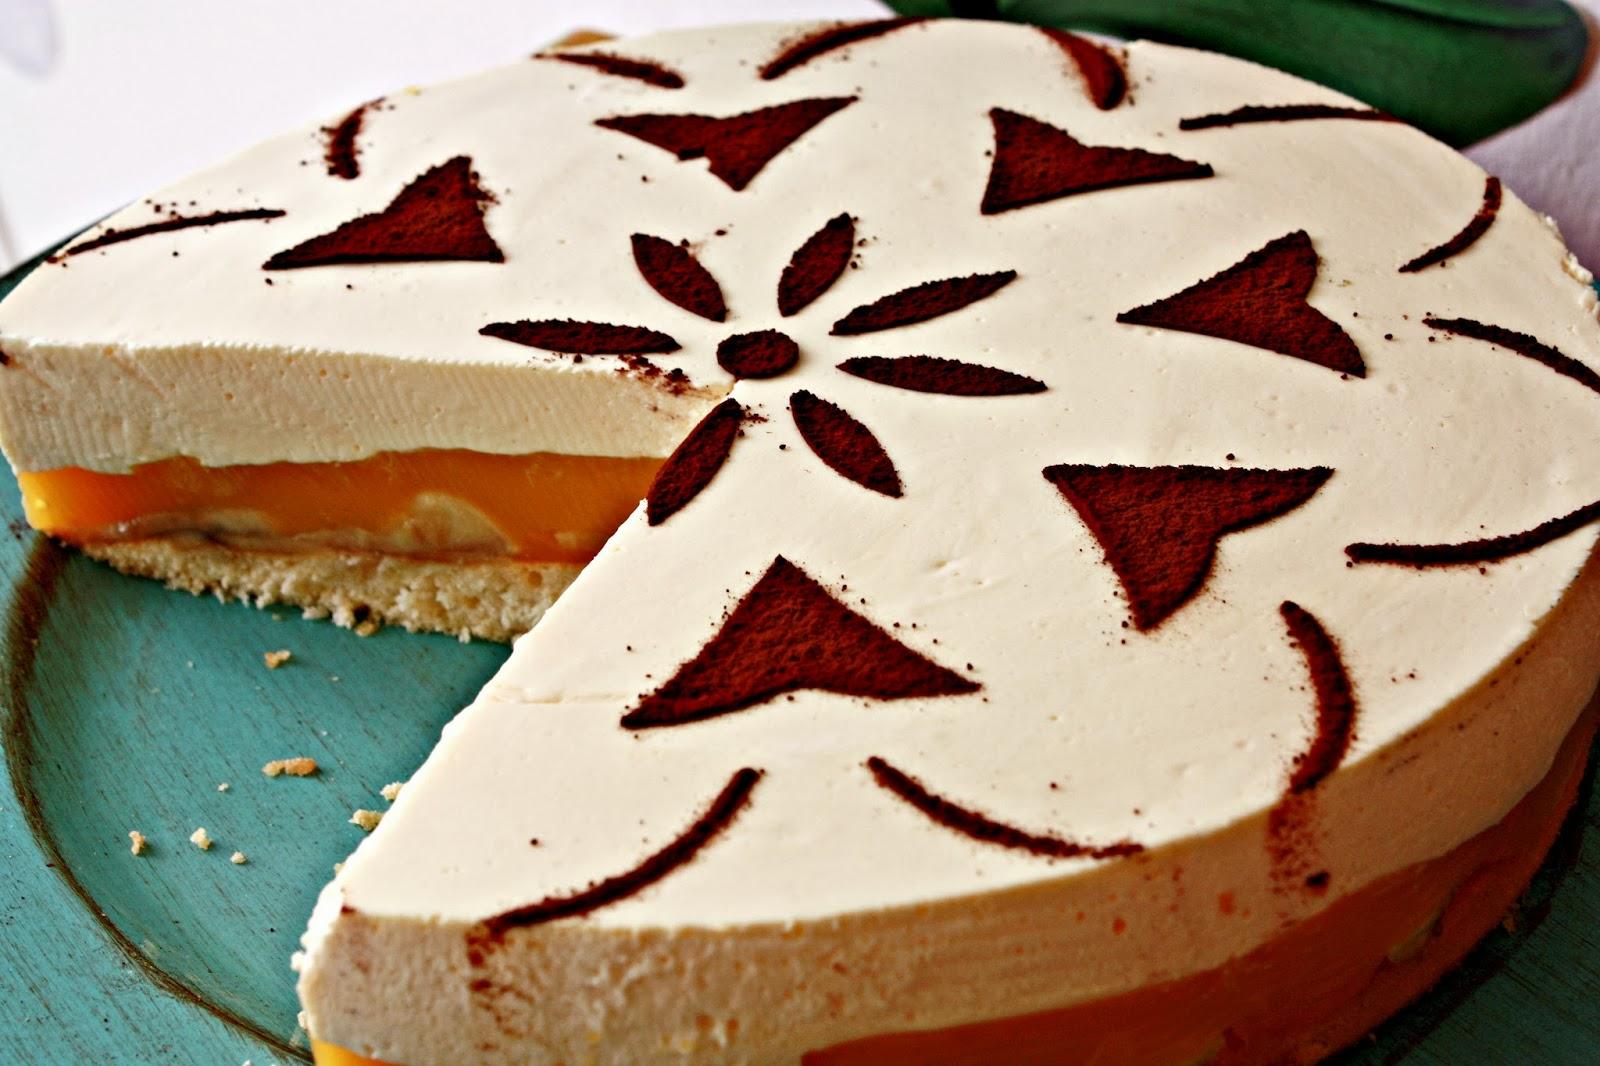 Maracuja Bananen Torte mit Eierlikör Topping